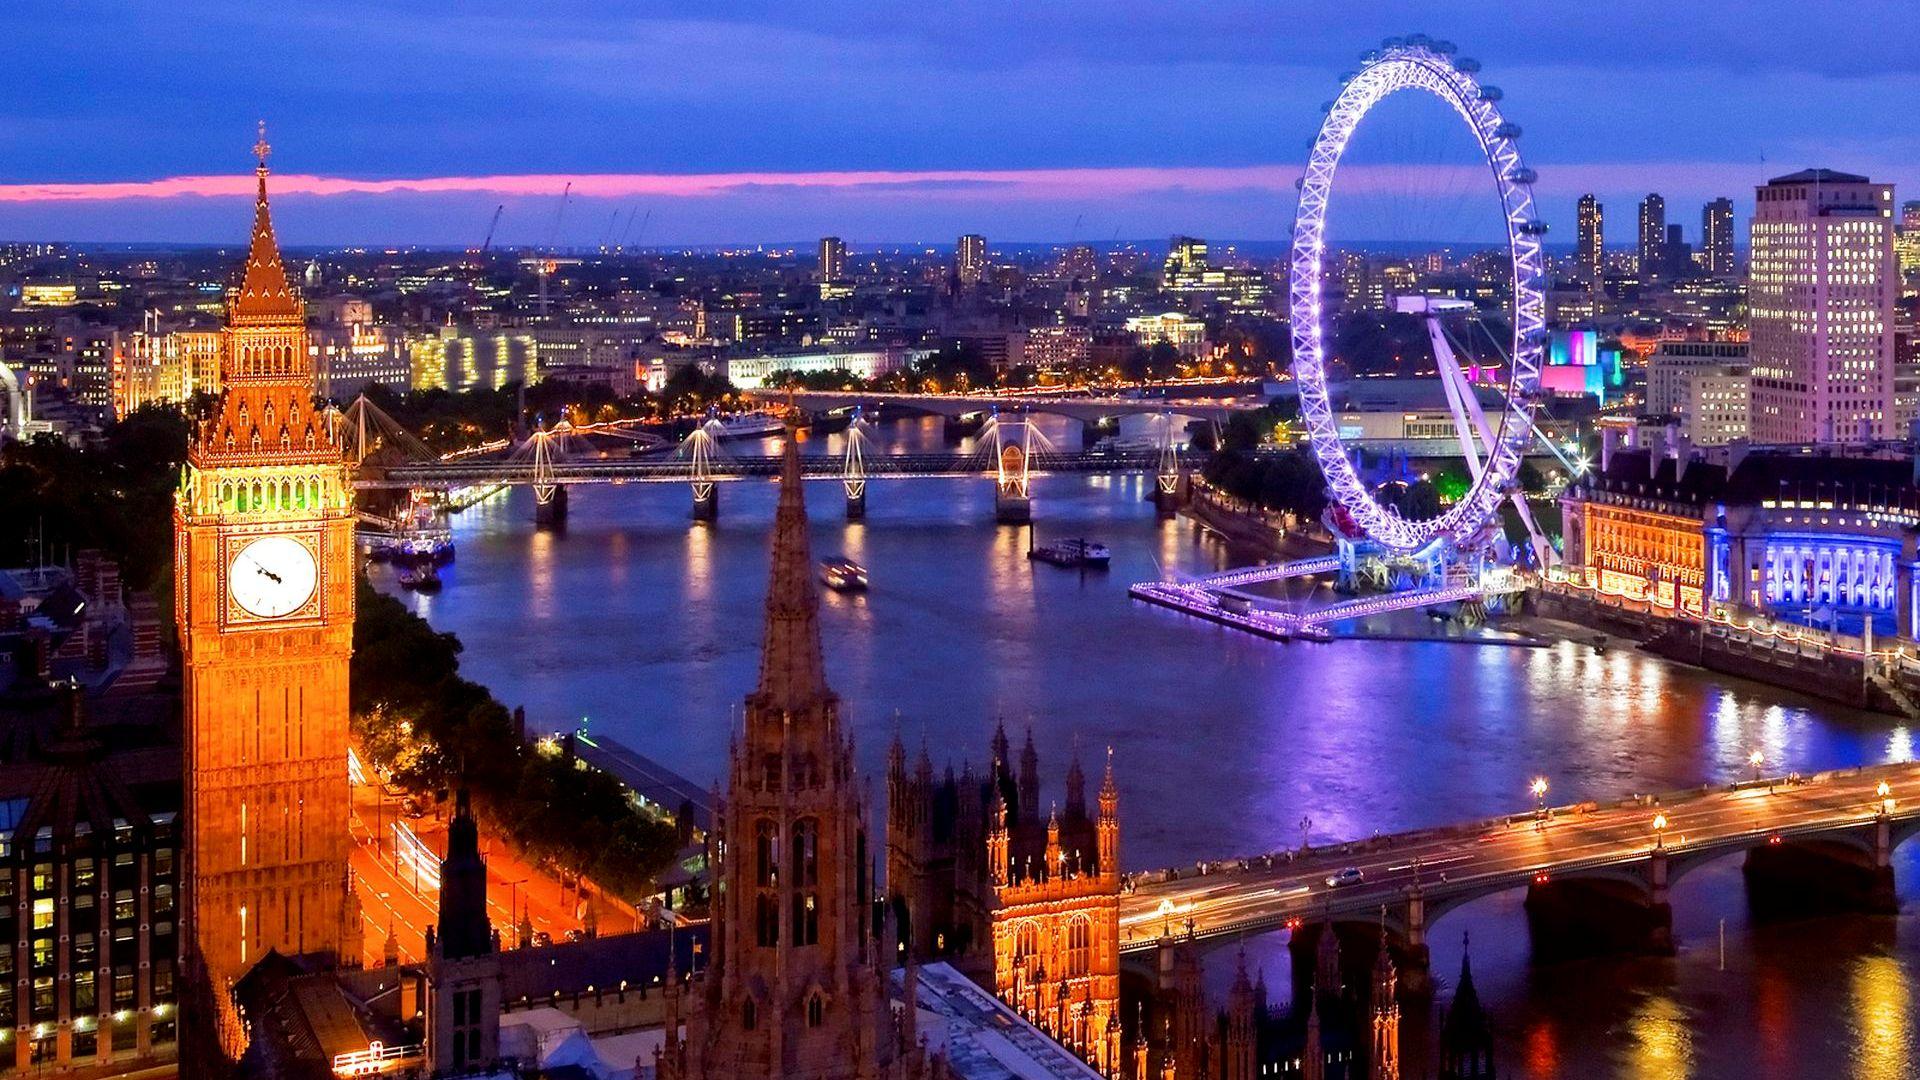 Great Britain united-kingdom,Westminster, London, England, UK 1920 × 1080